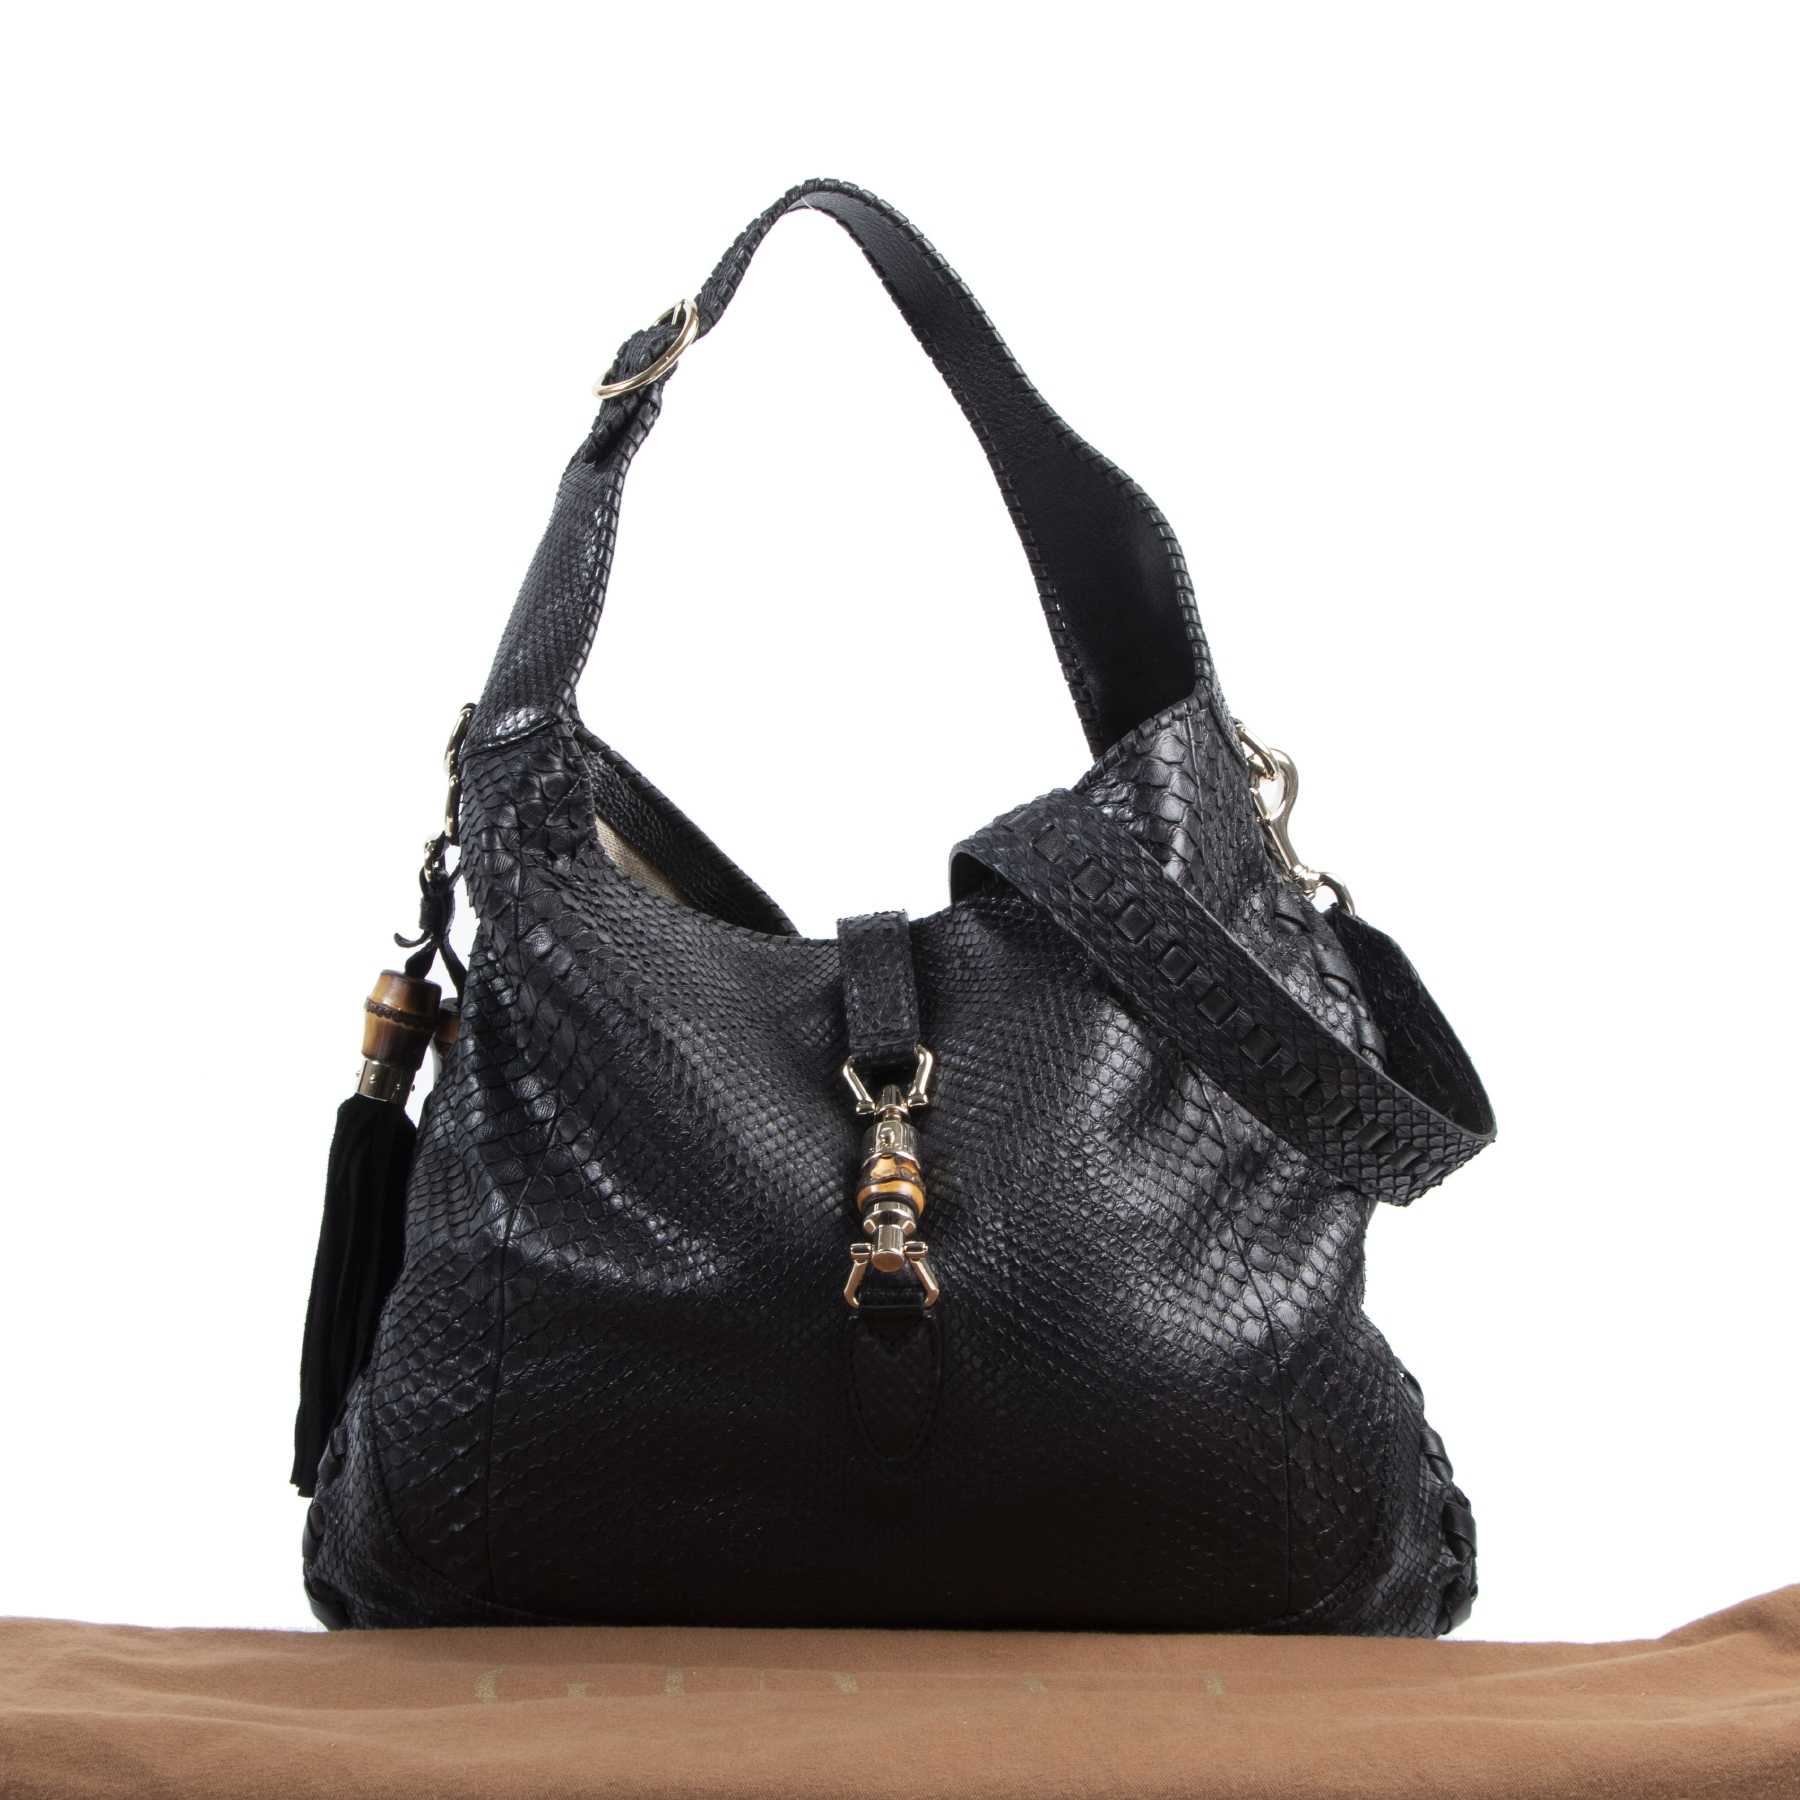 Authentic secondhand Gucci Black Python Jackie Hobo Leather Bag designer bags fashion luxury vintage webshop safe secure online shopping high end designer brands leather bags